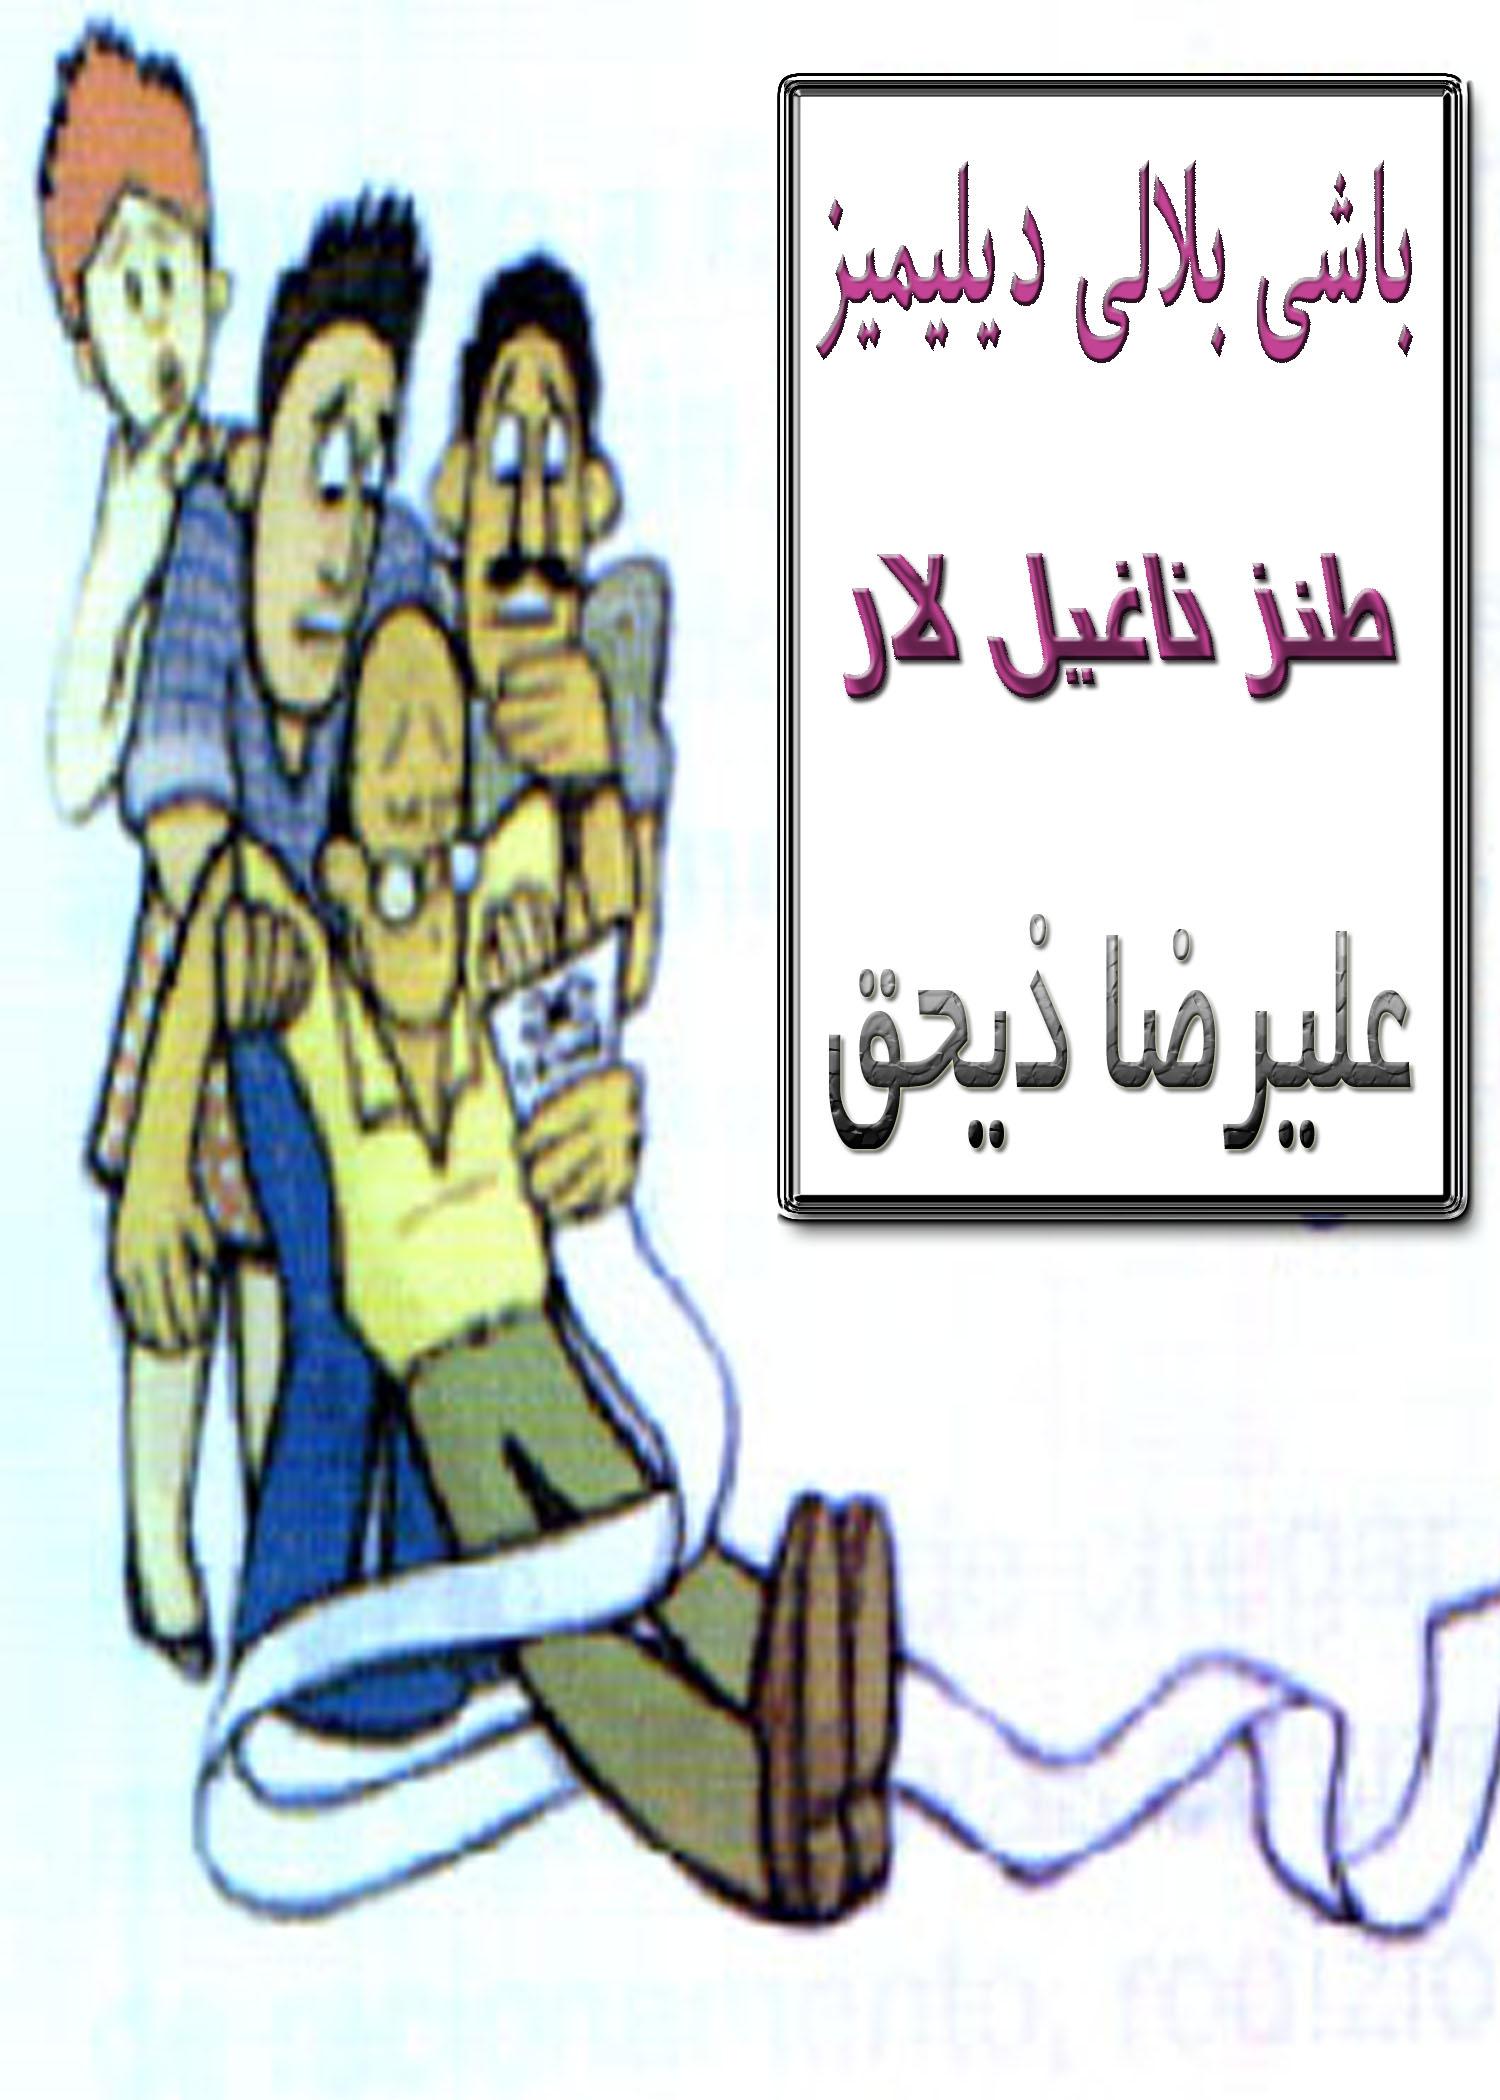 http://s2.picofile.com/file/7181785264/3B19_1.jpg